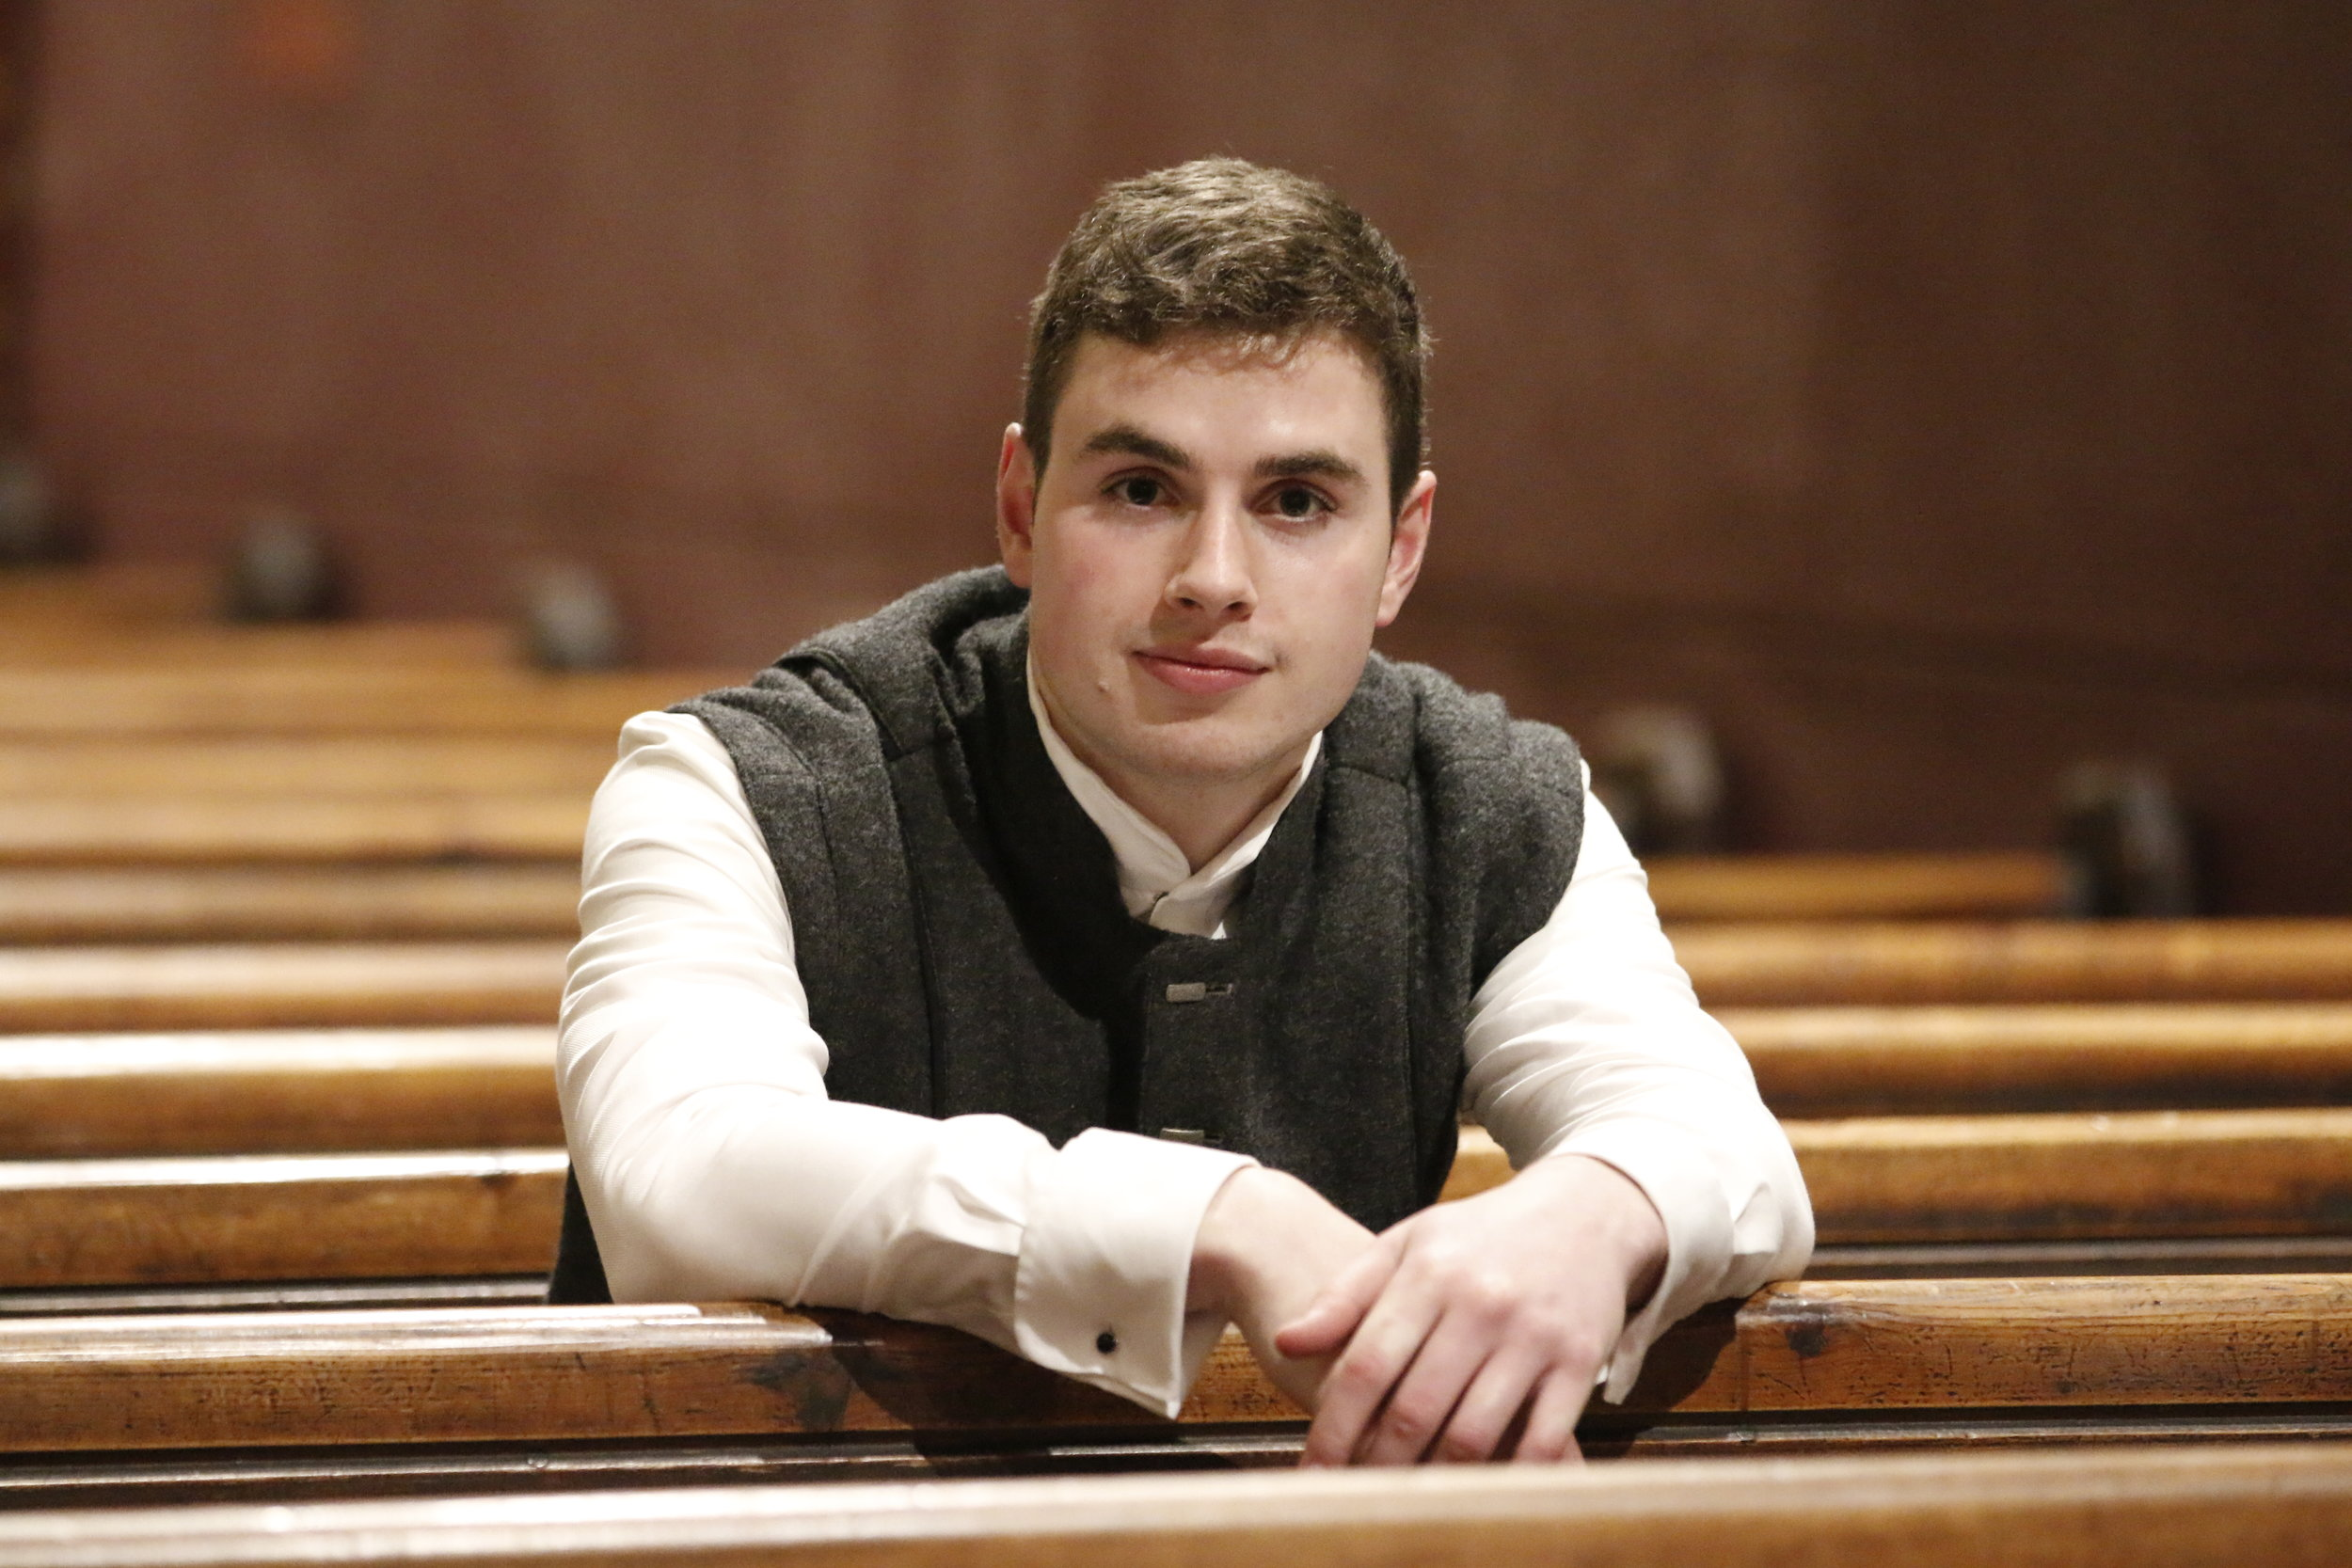 Patrick McGinley (Image Nejc Rudel)